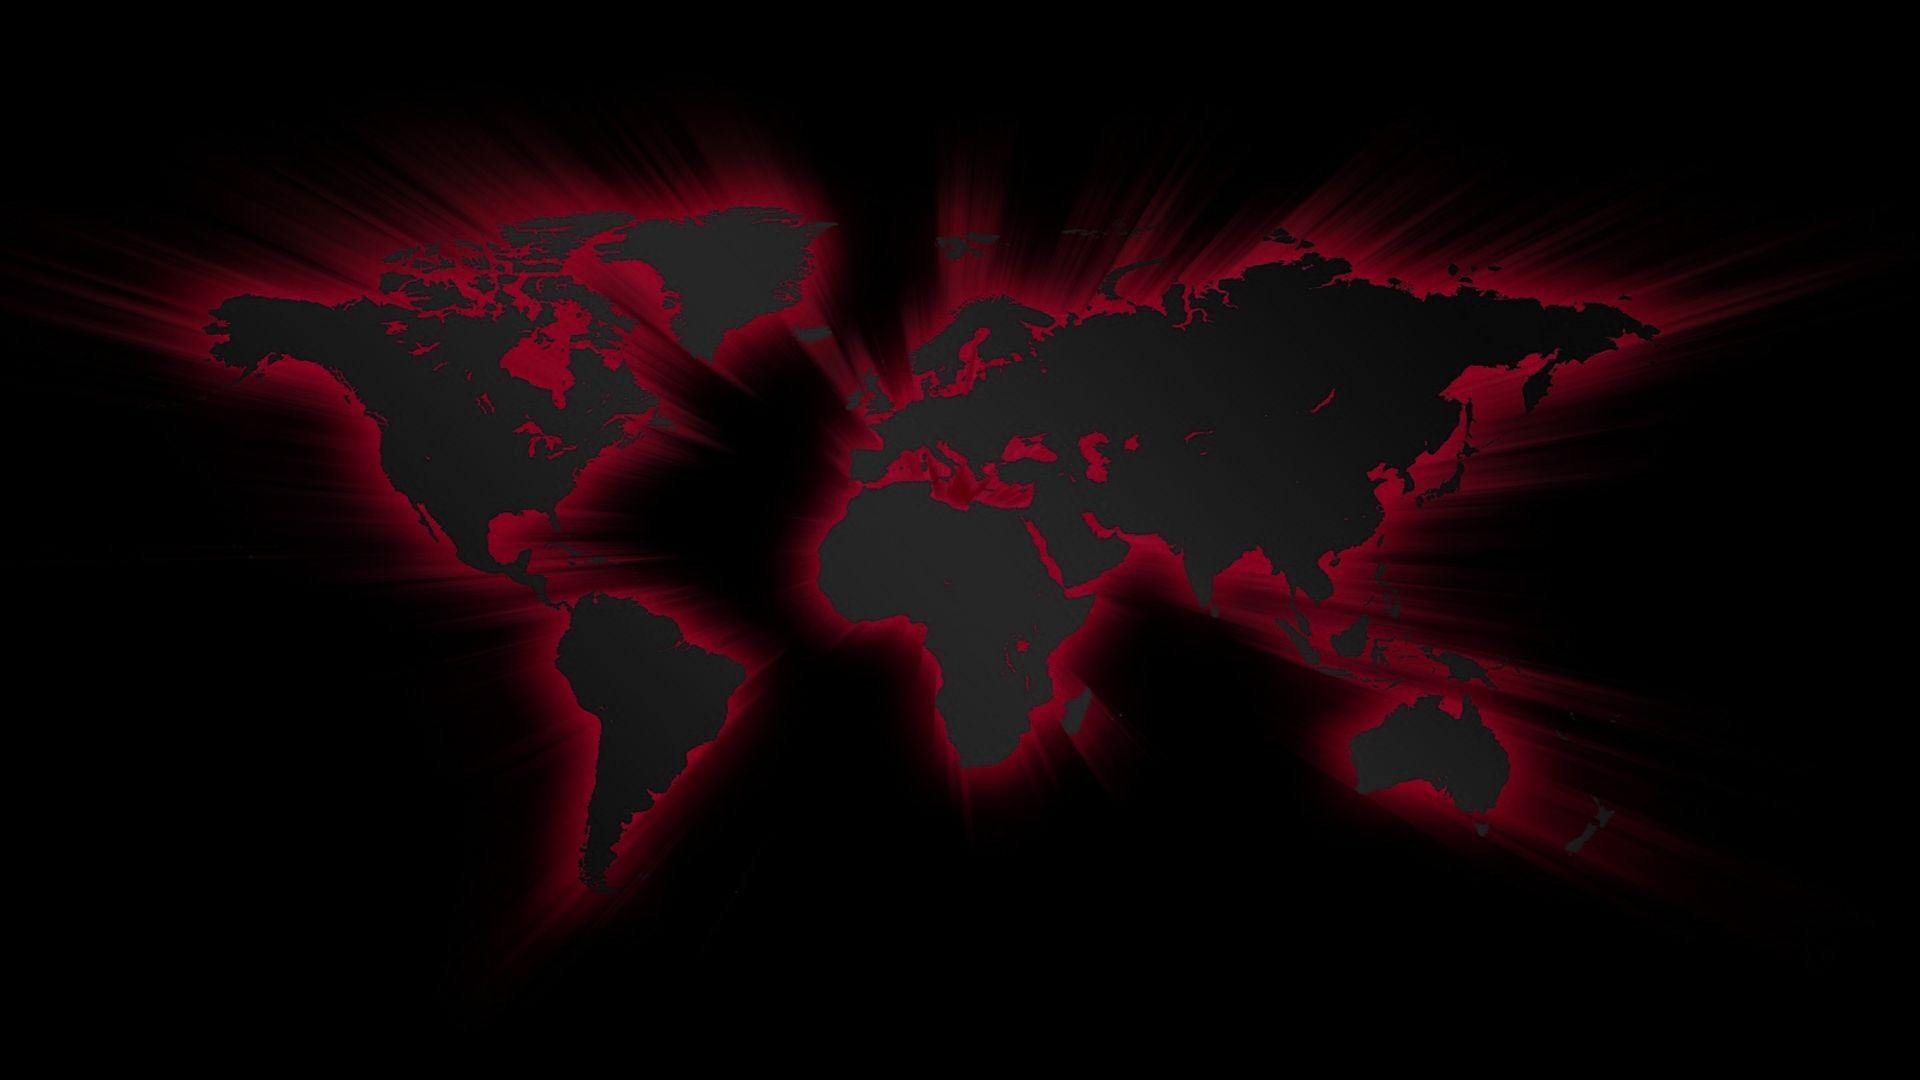 World map wallpaper hd black allofthepicts world map black hd wallpaper wallpapers 1920x1080px gumiabroncs Choice Image